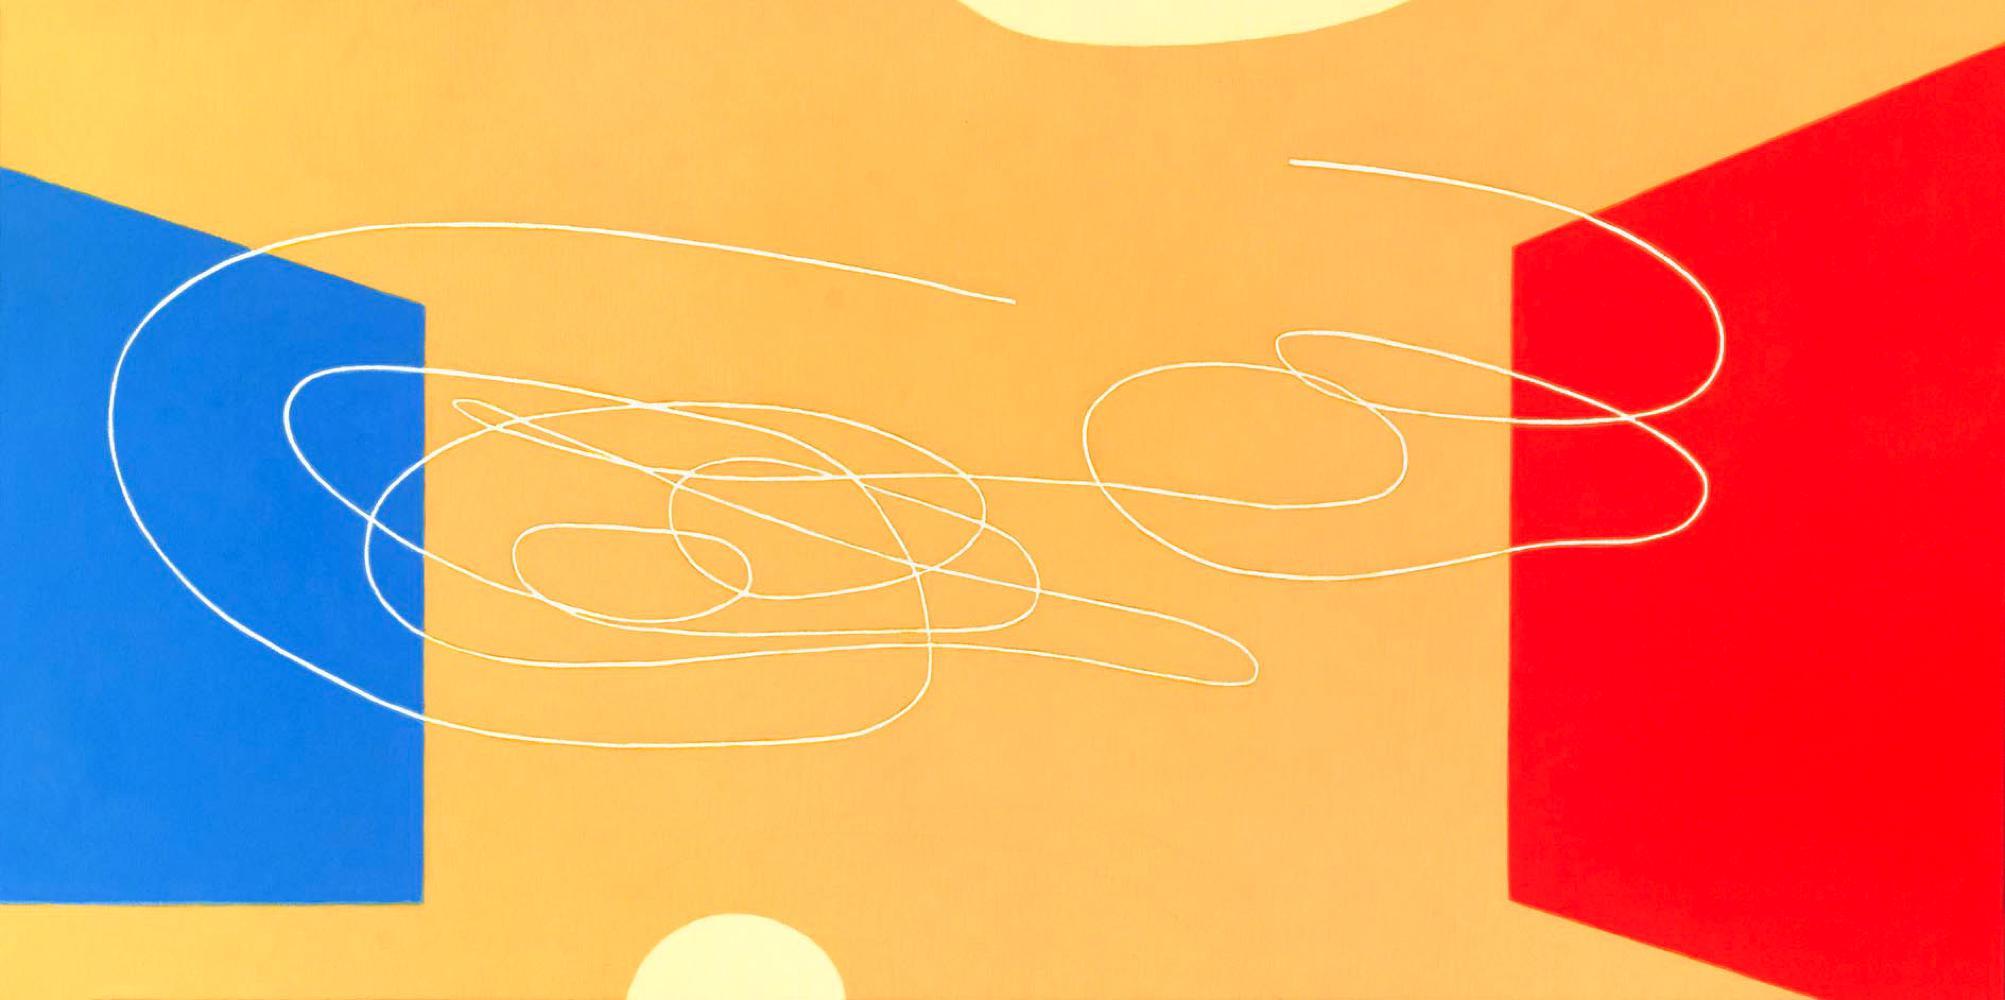 Lucio Fontana en Caixa Forum, 50 x 100 cm, óleo lienzo, 2007.